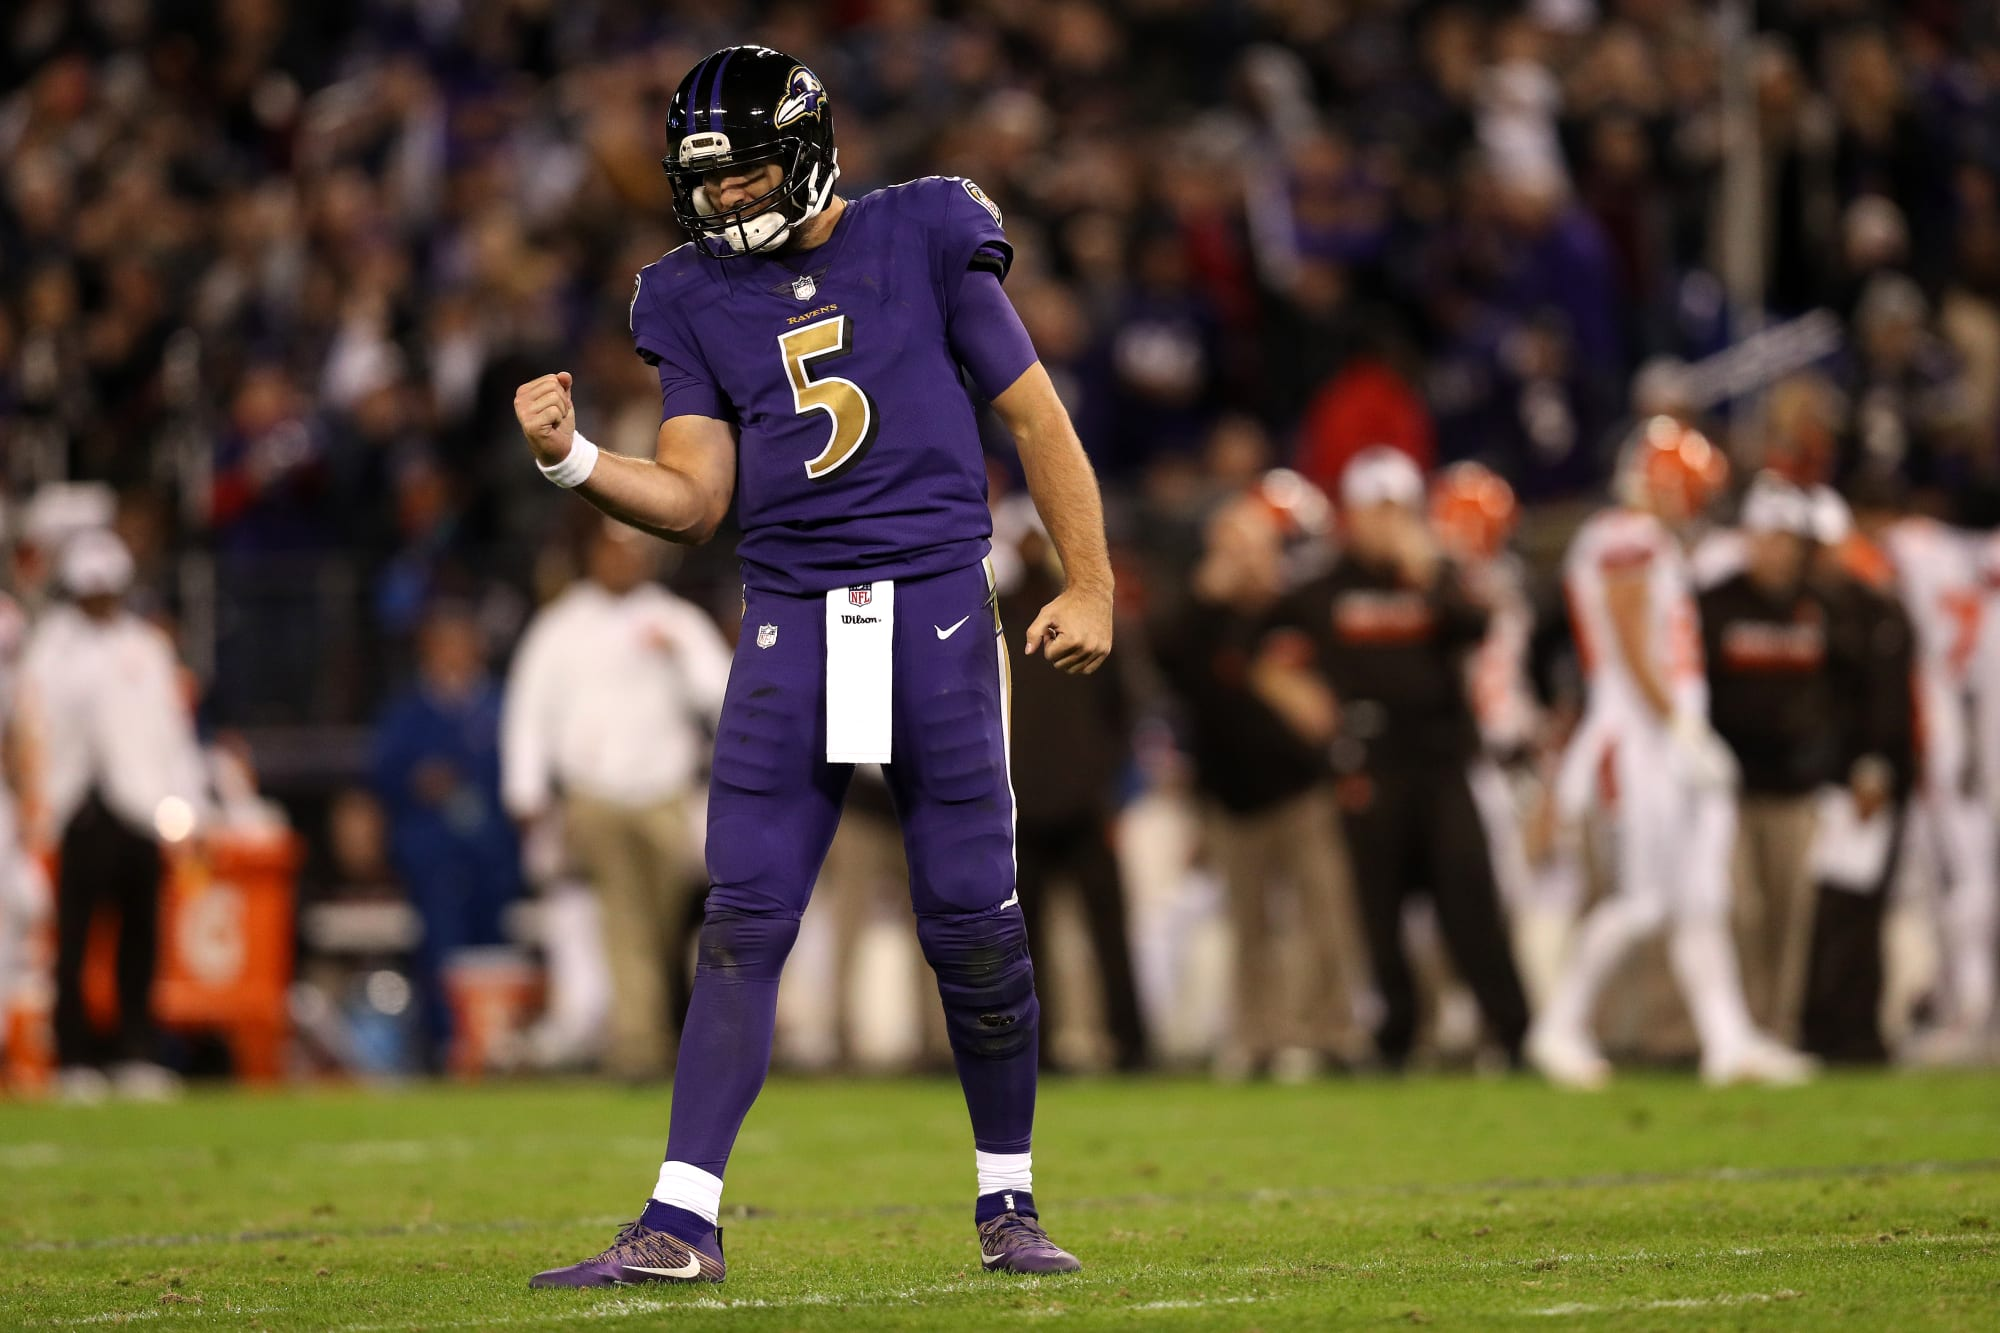 Baltimore Ravens: A look at Thursday's Color Rush uniforms